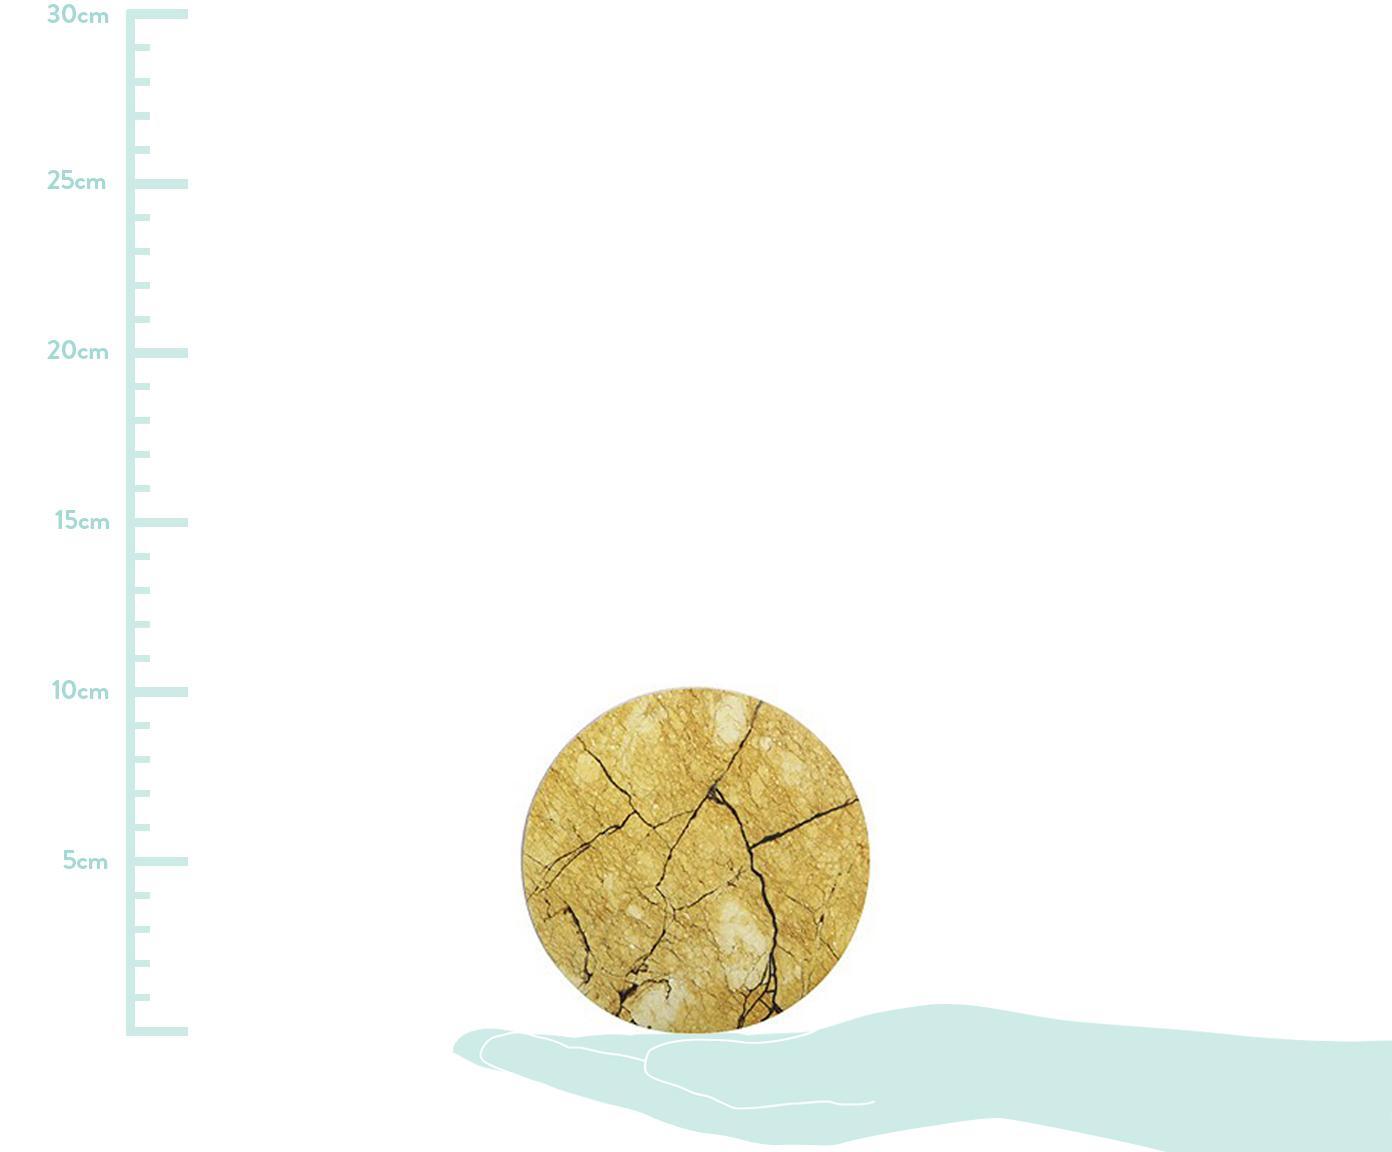 Komplet podstawek Ofelia, 6 elem., Korek, Wielobarwny, Ø 10 cm